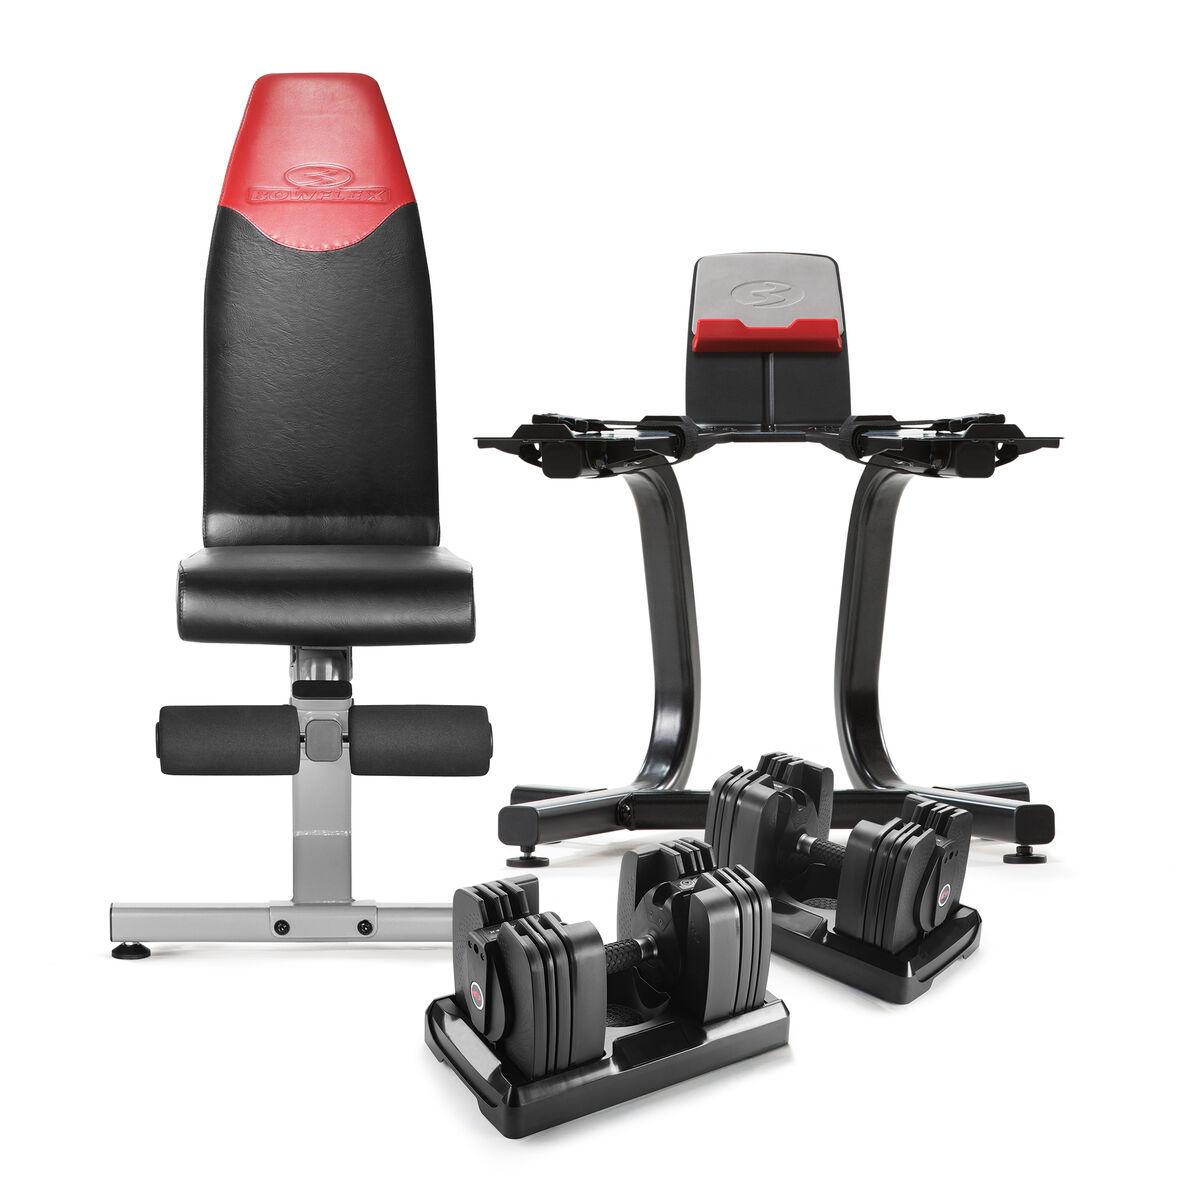 Bowflex SelectTech 560, Bench, and Stand Bundle